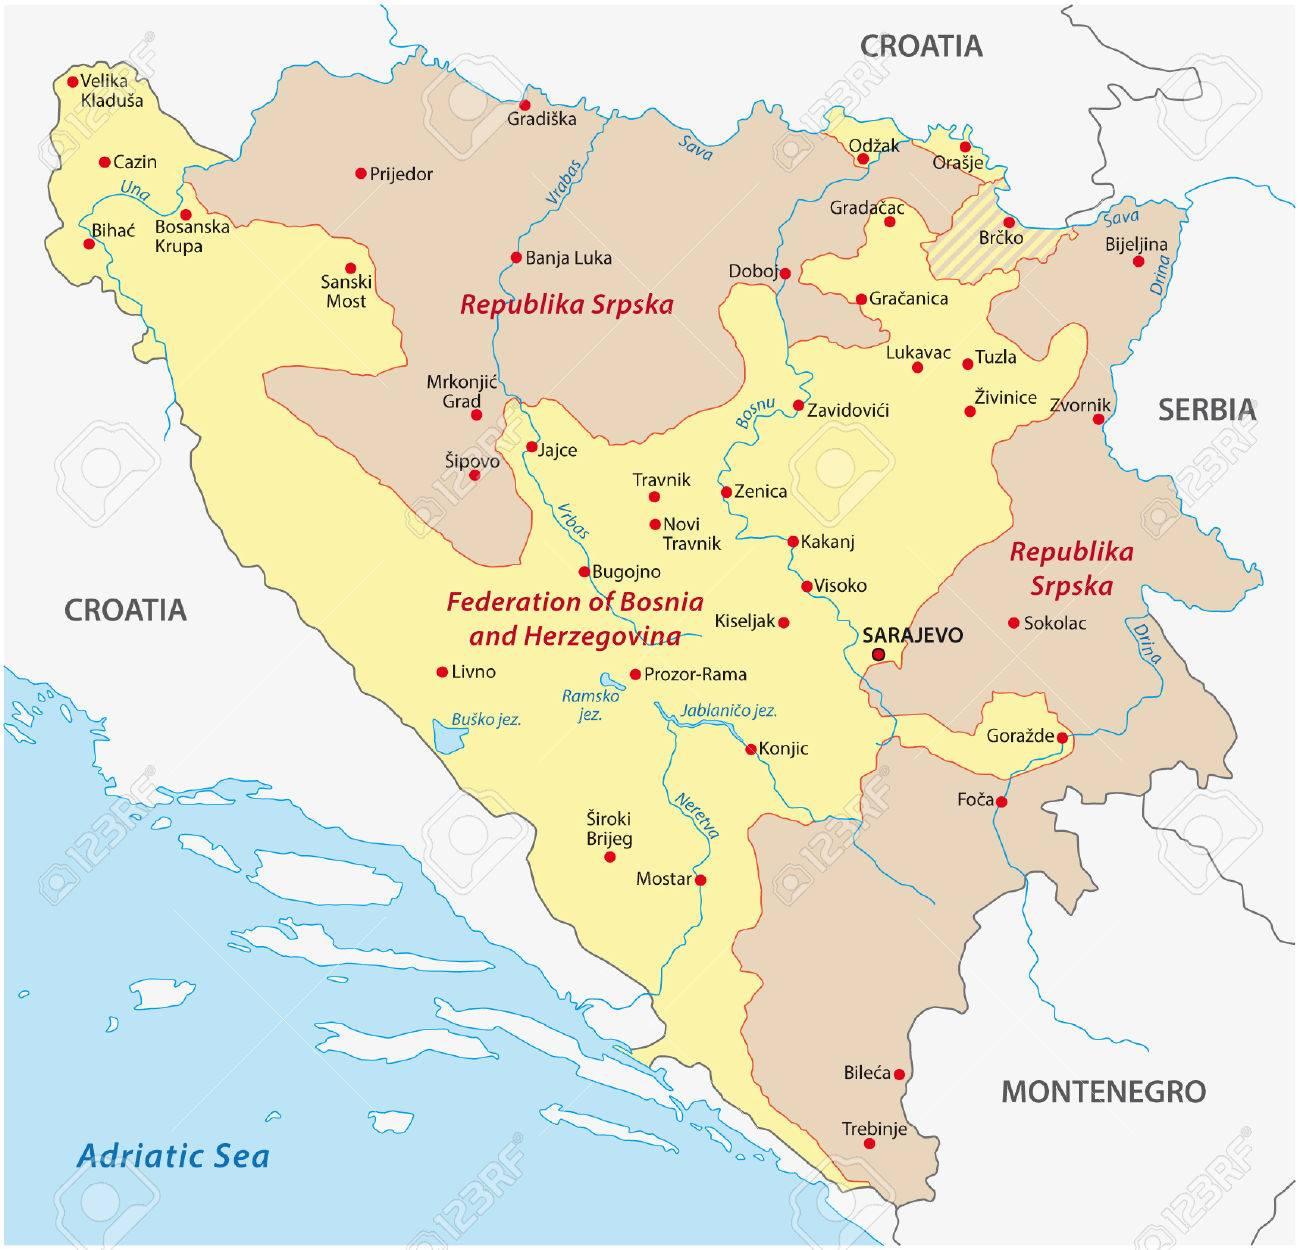 bosnia and herzegovina map on croatia map, luxembourg map, eritrea map, bulgaria map, srebrenica massacre, monaco map, serbia map, austria map, iran map, bosnian war, vatican city map, turkey map, estonia map, albania map, slovakia map, slovenia map, republika srpska, macedonia map, hungary map, ukraine map, kosovo map, republic of macedonia, san marino map,